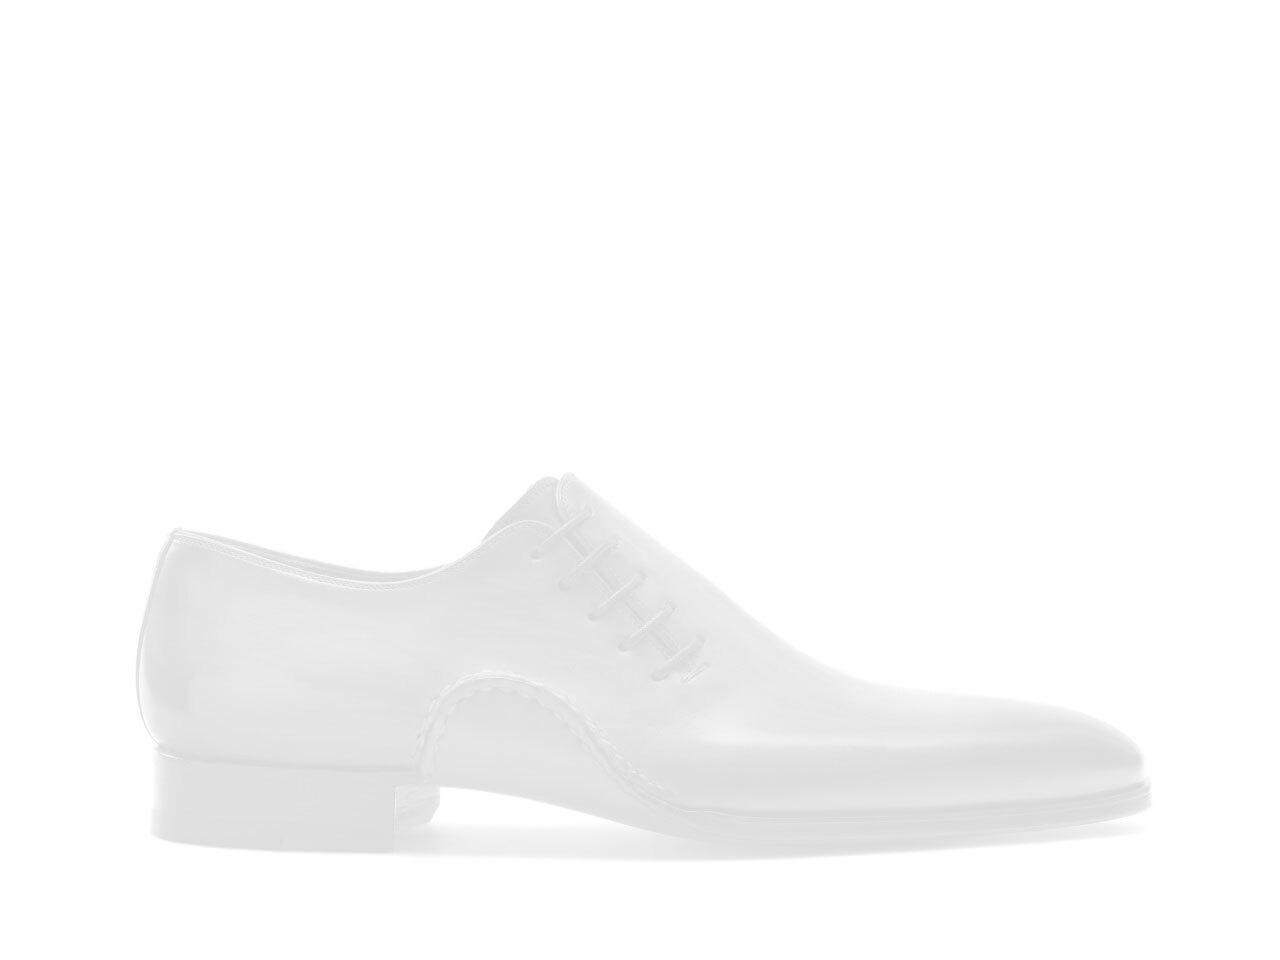 Side view of the Magnanni Playa Perf Cognac Men's Sandal Slides